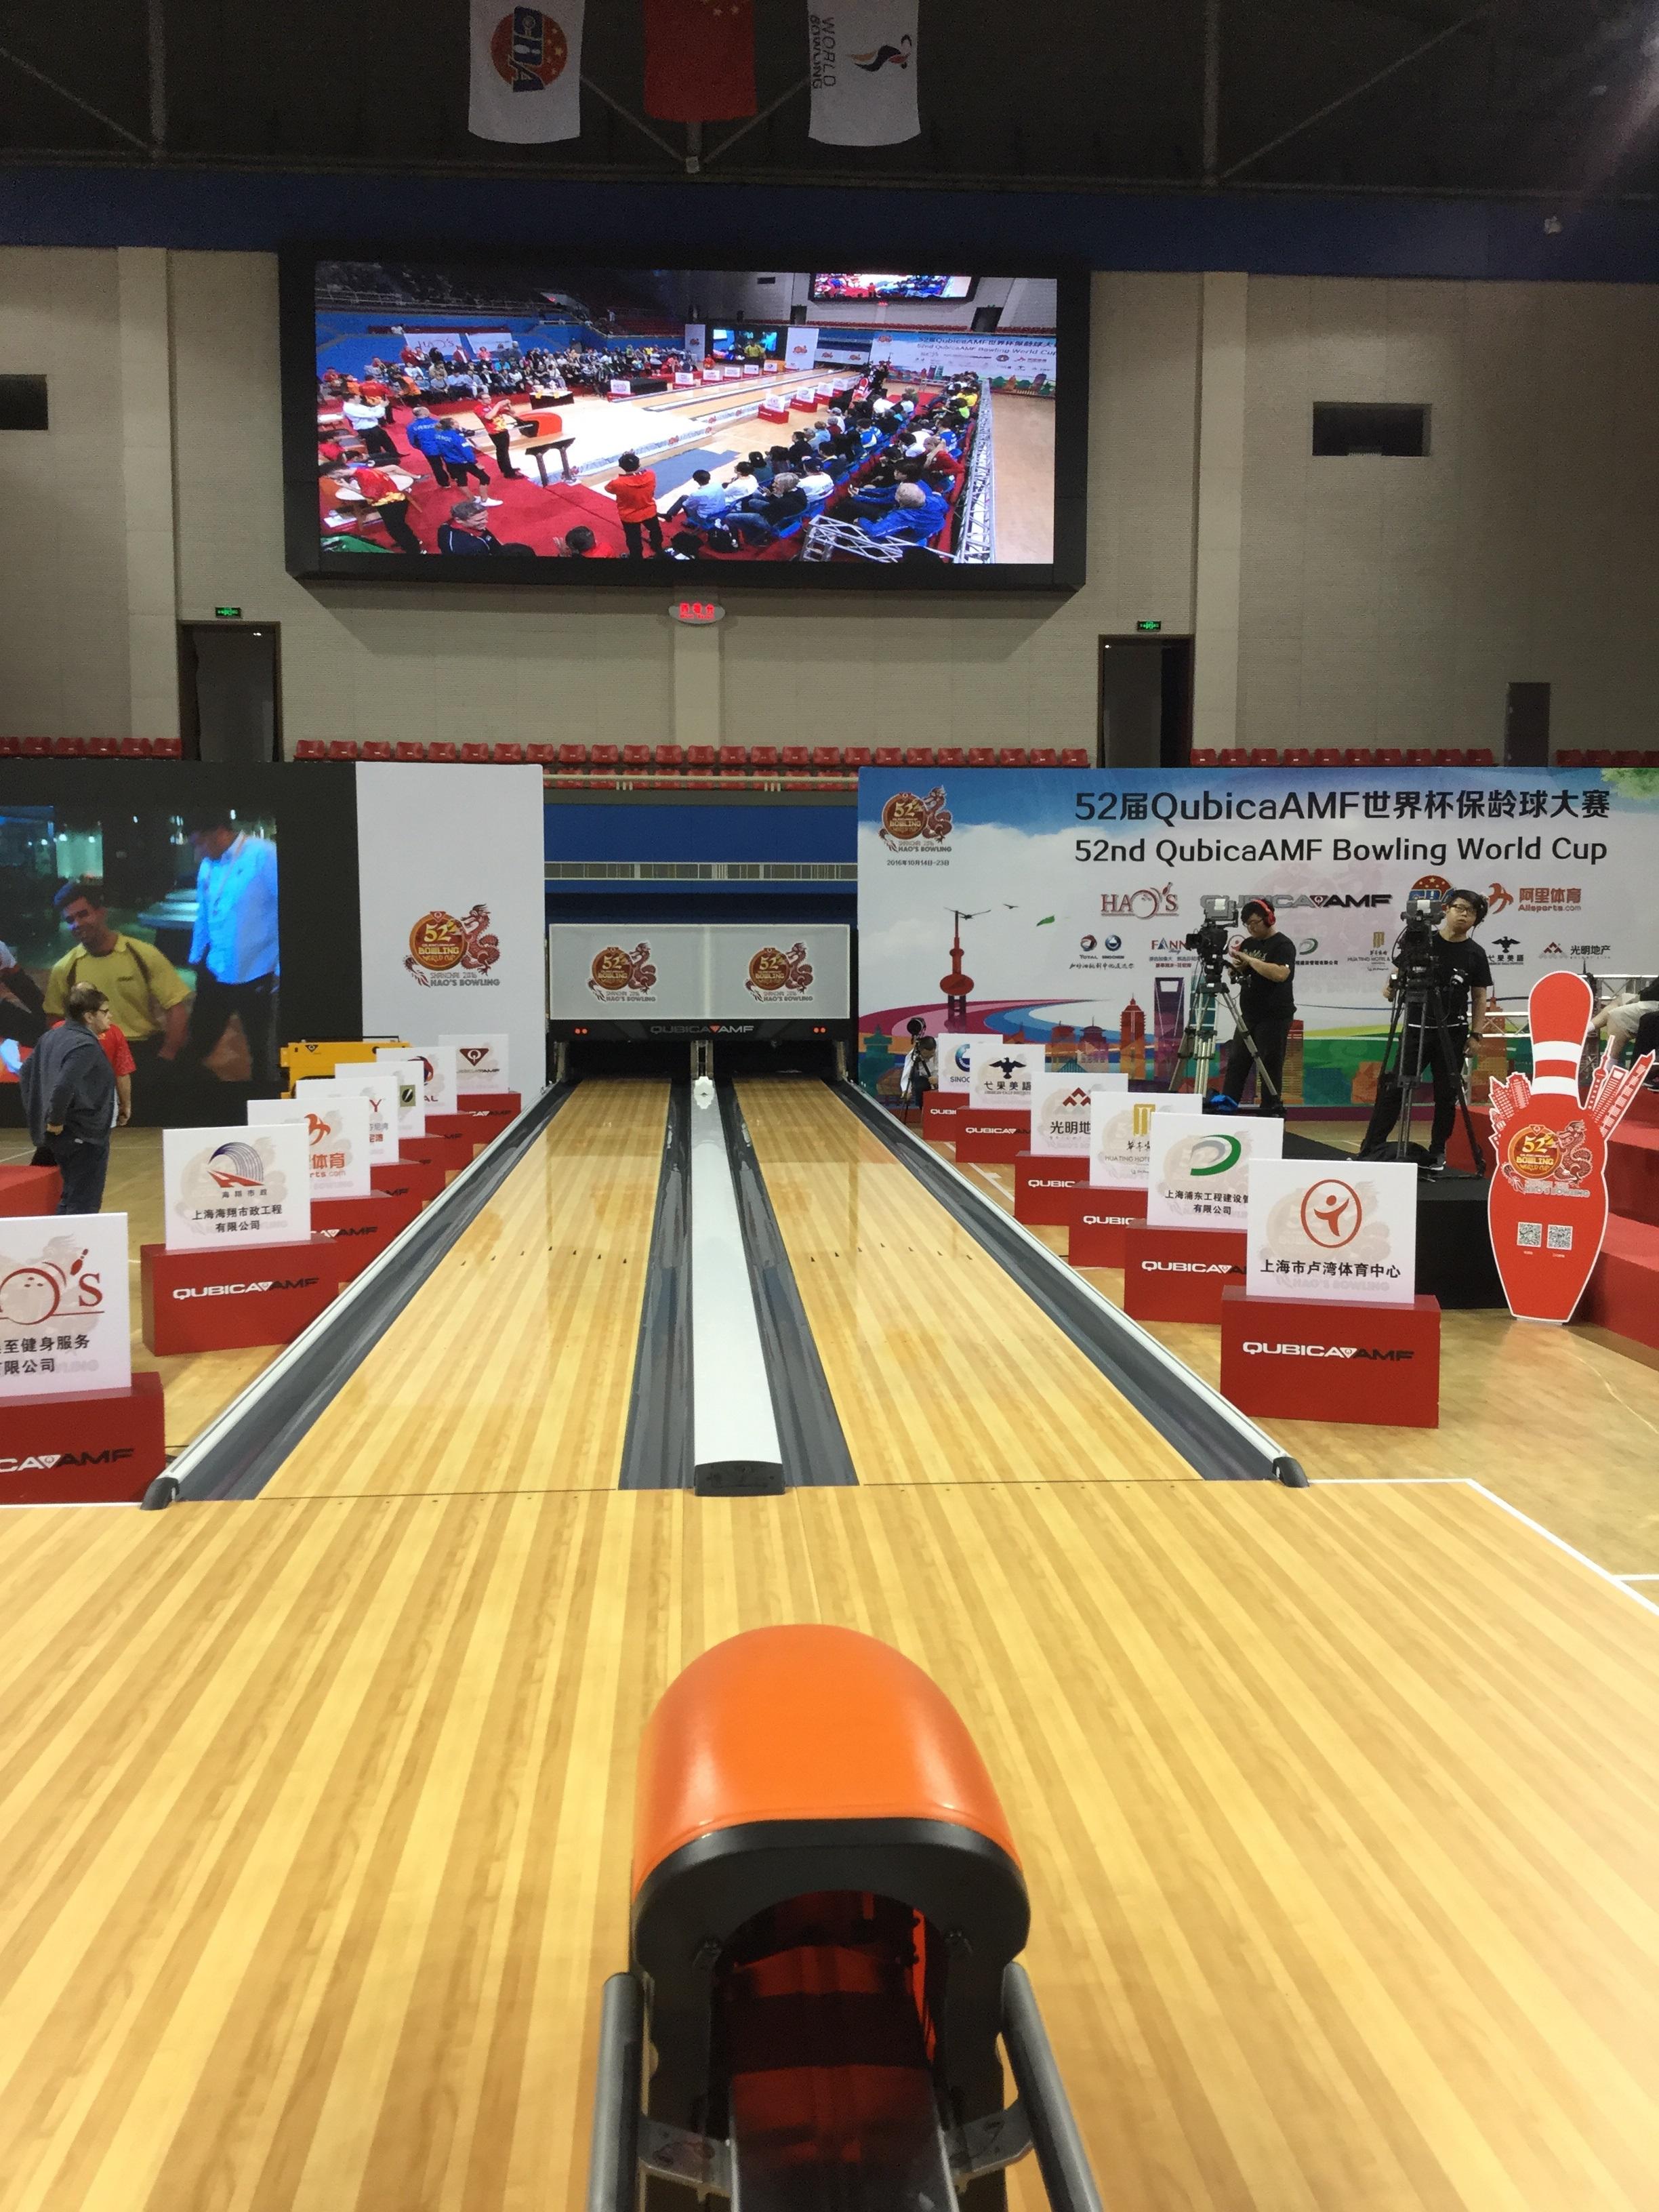 2016 Bowling World Cup Award Winners Qubicaamf